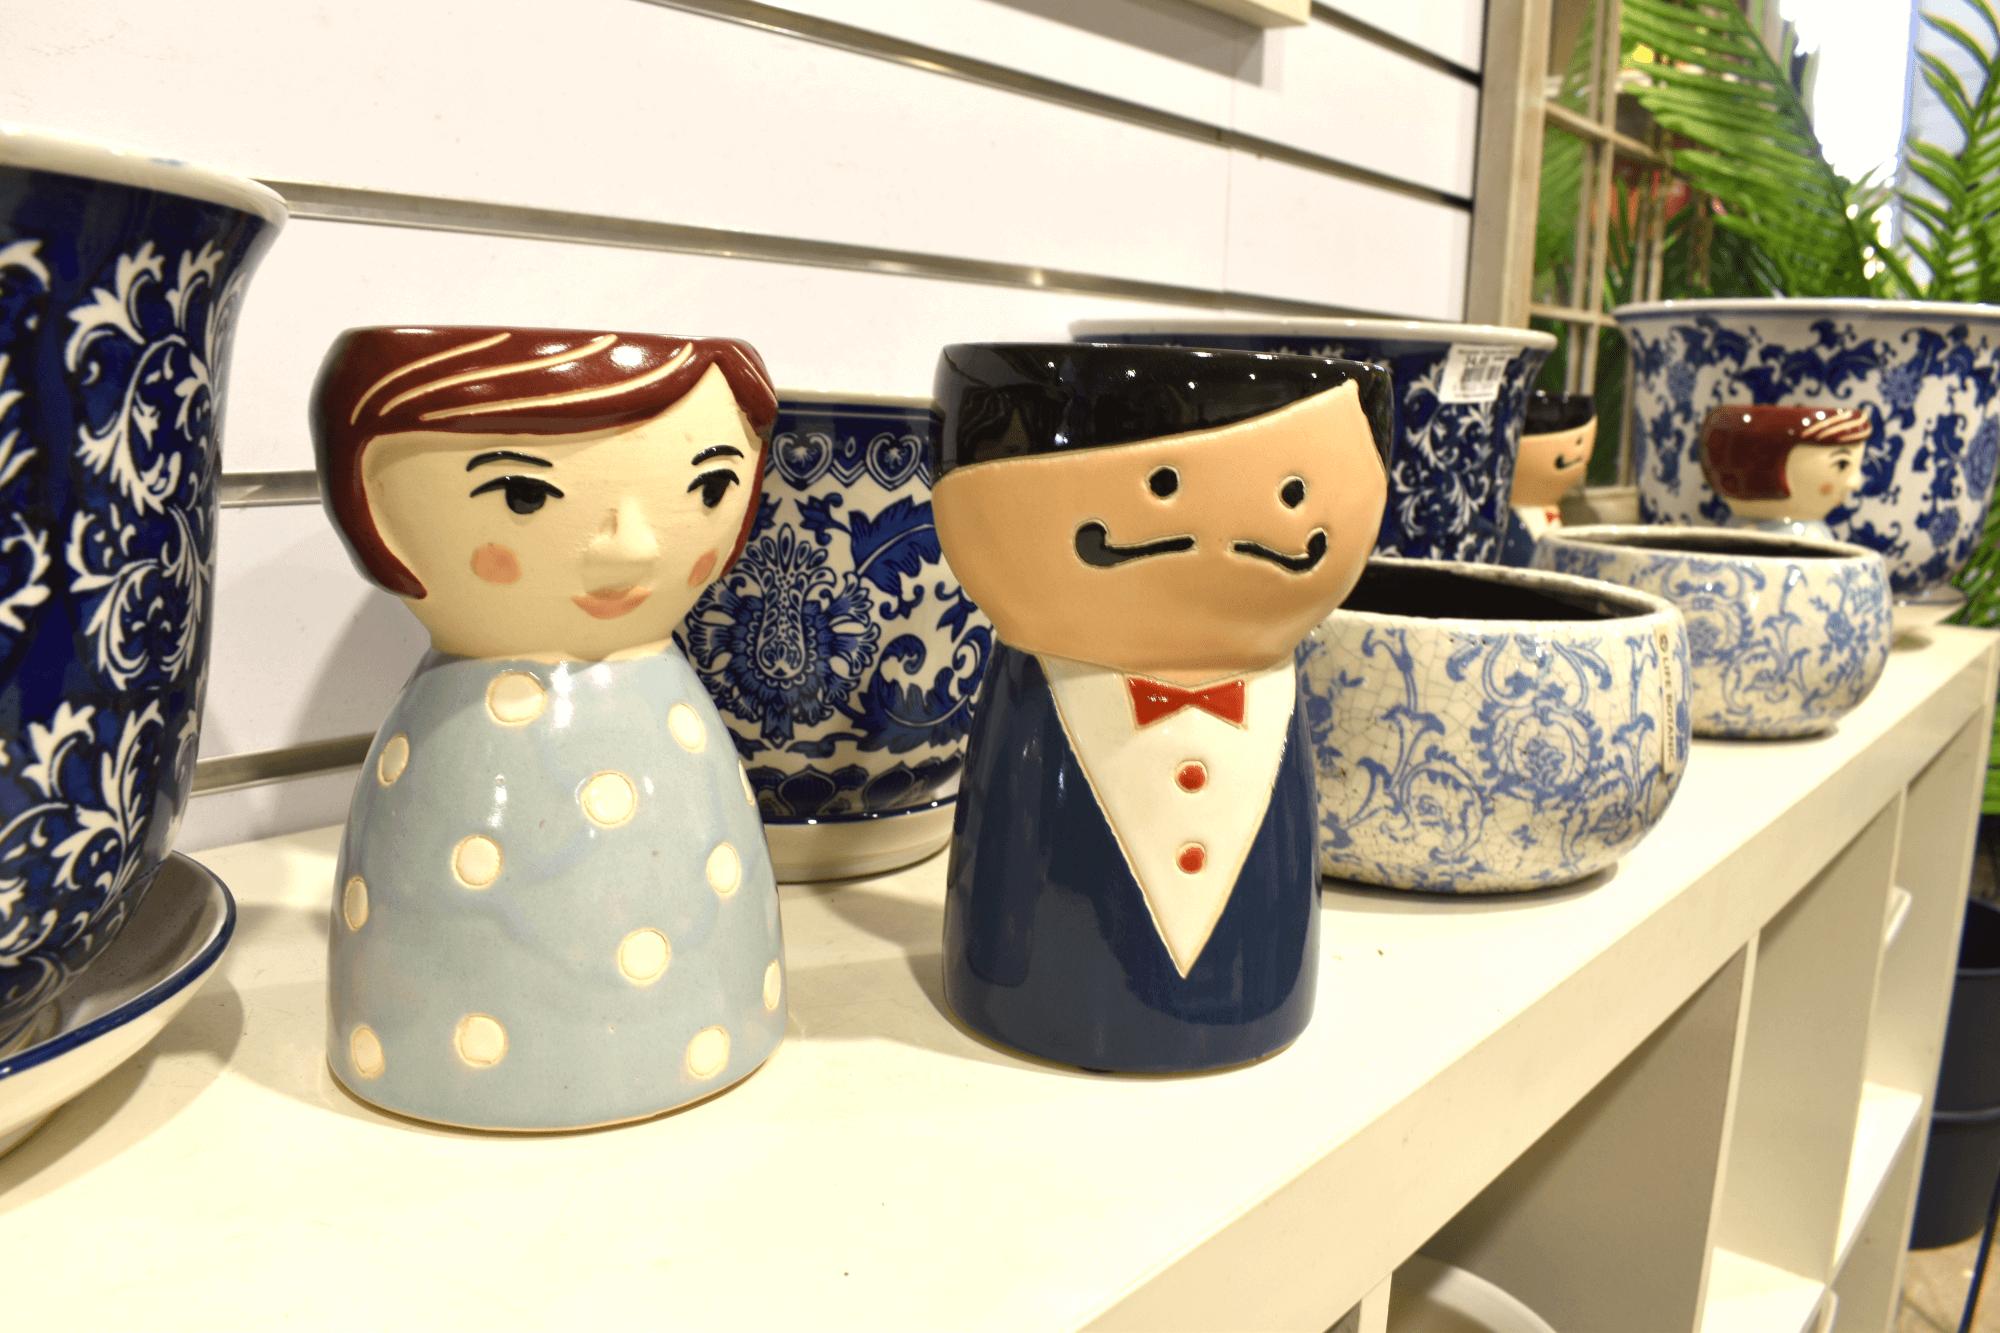 manawee pot showroom